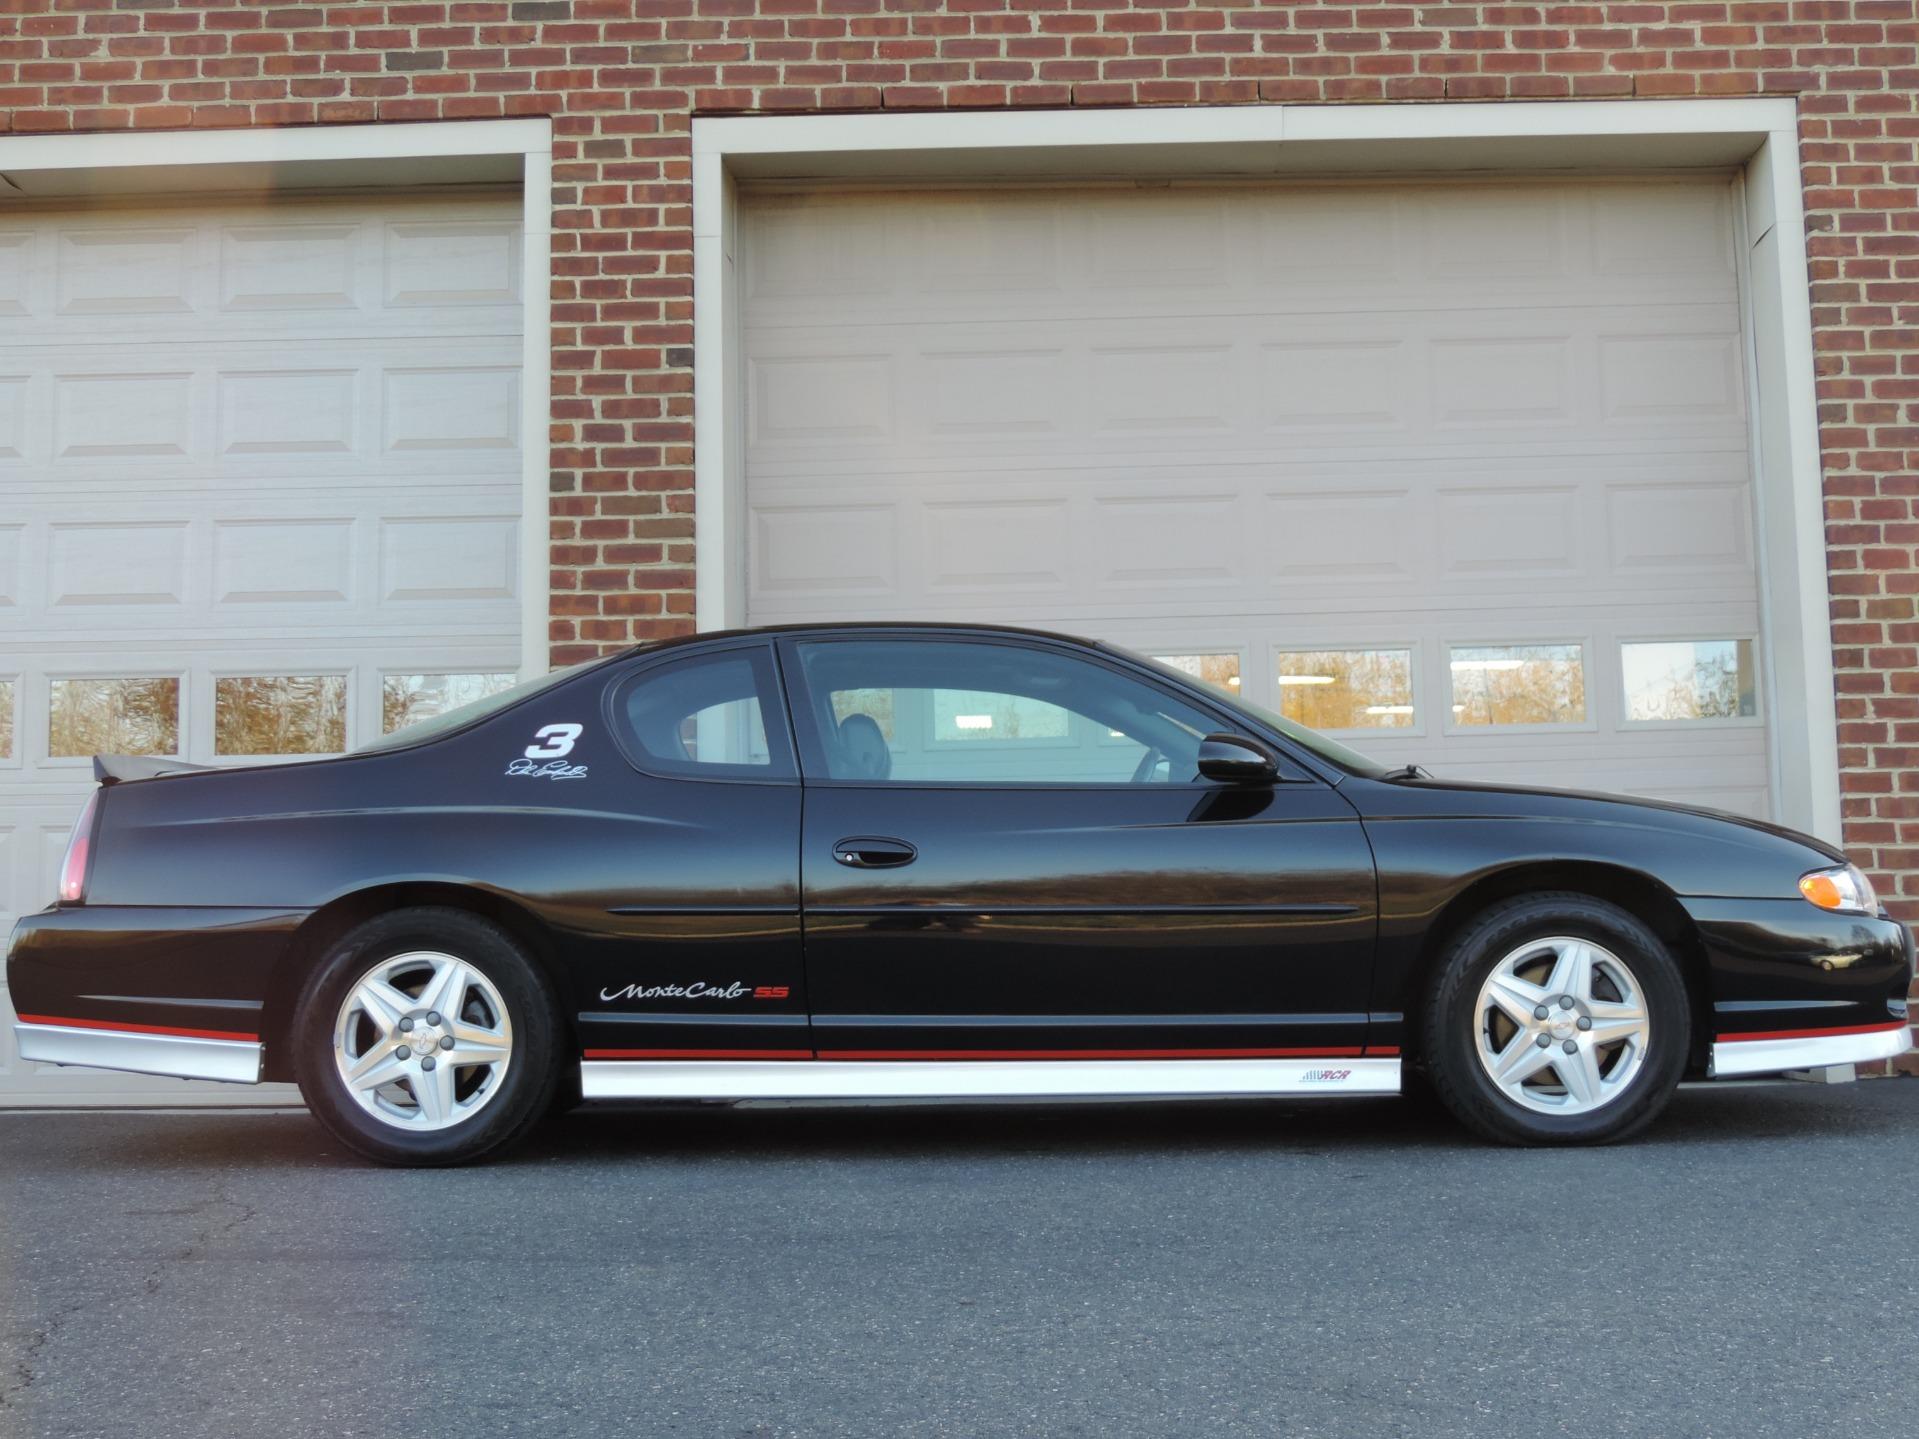 Used-2002-Chevrolet-Monte-Carlo-SS-Dale-Earnhardt